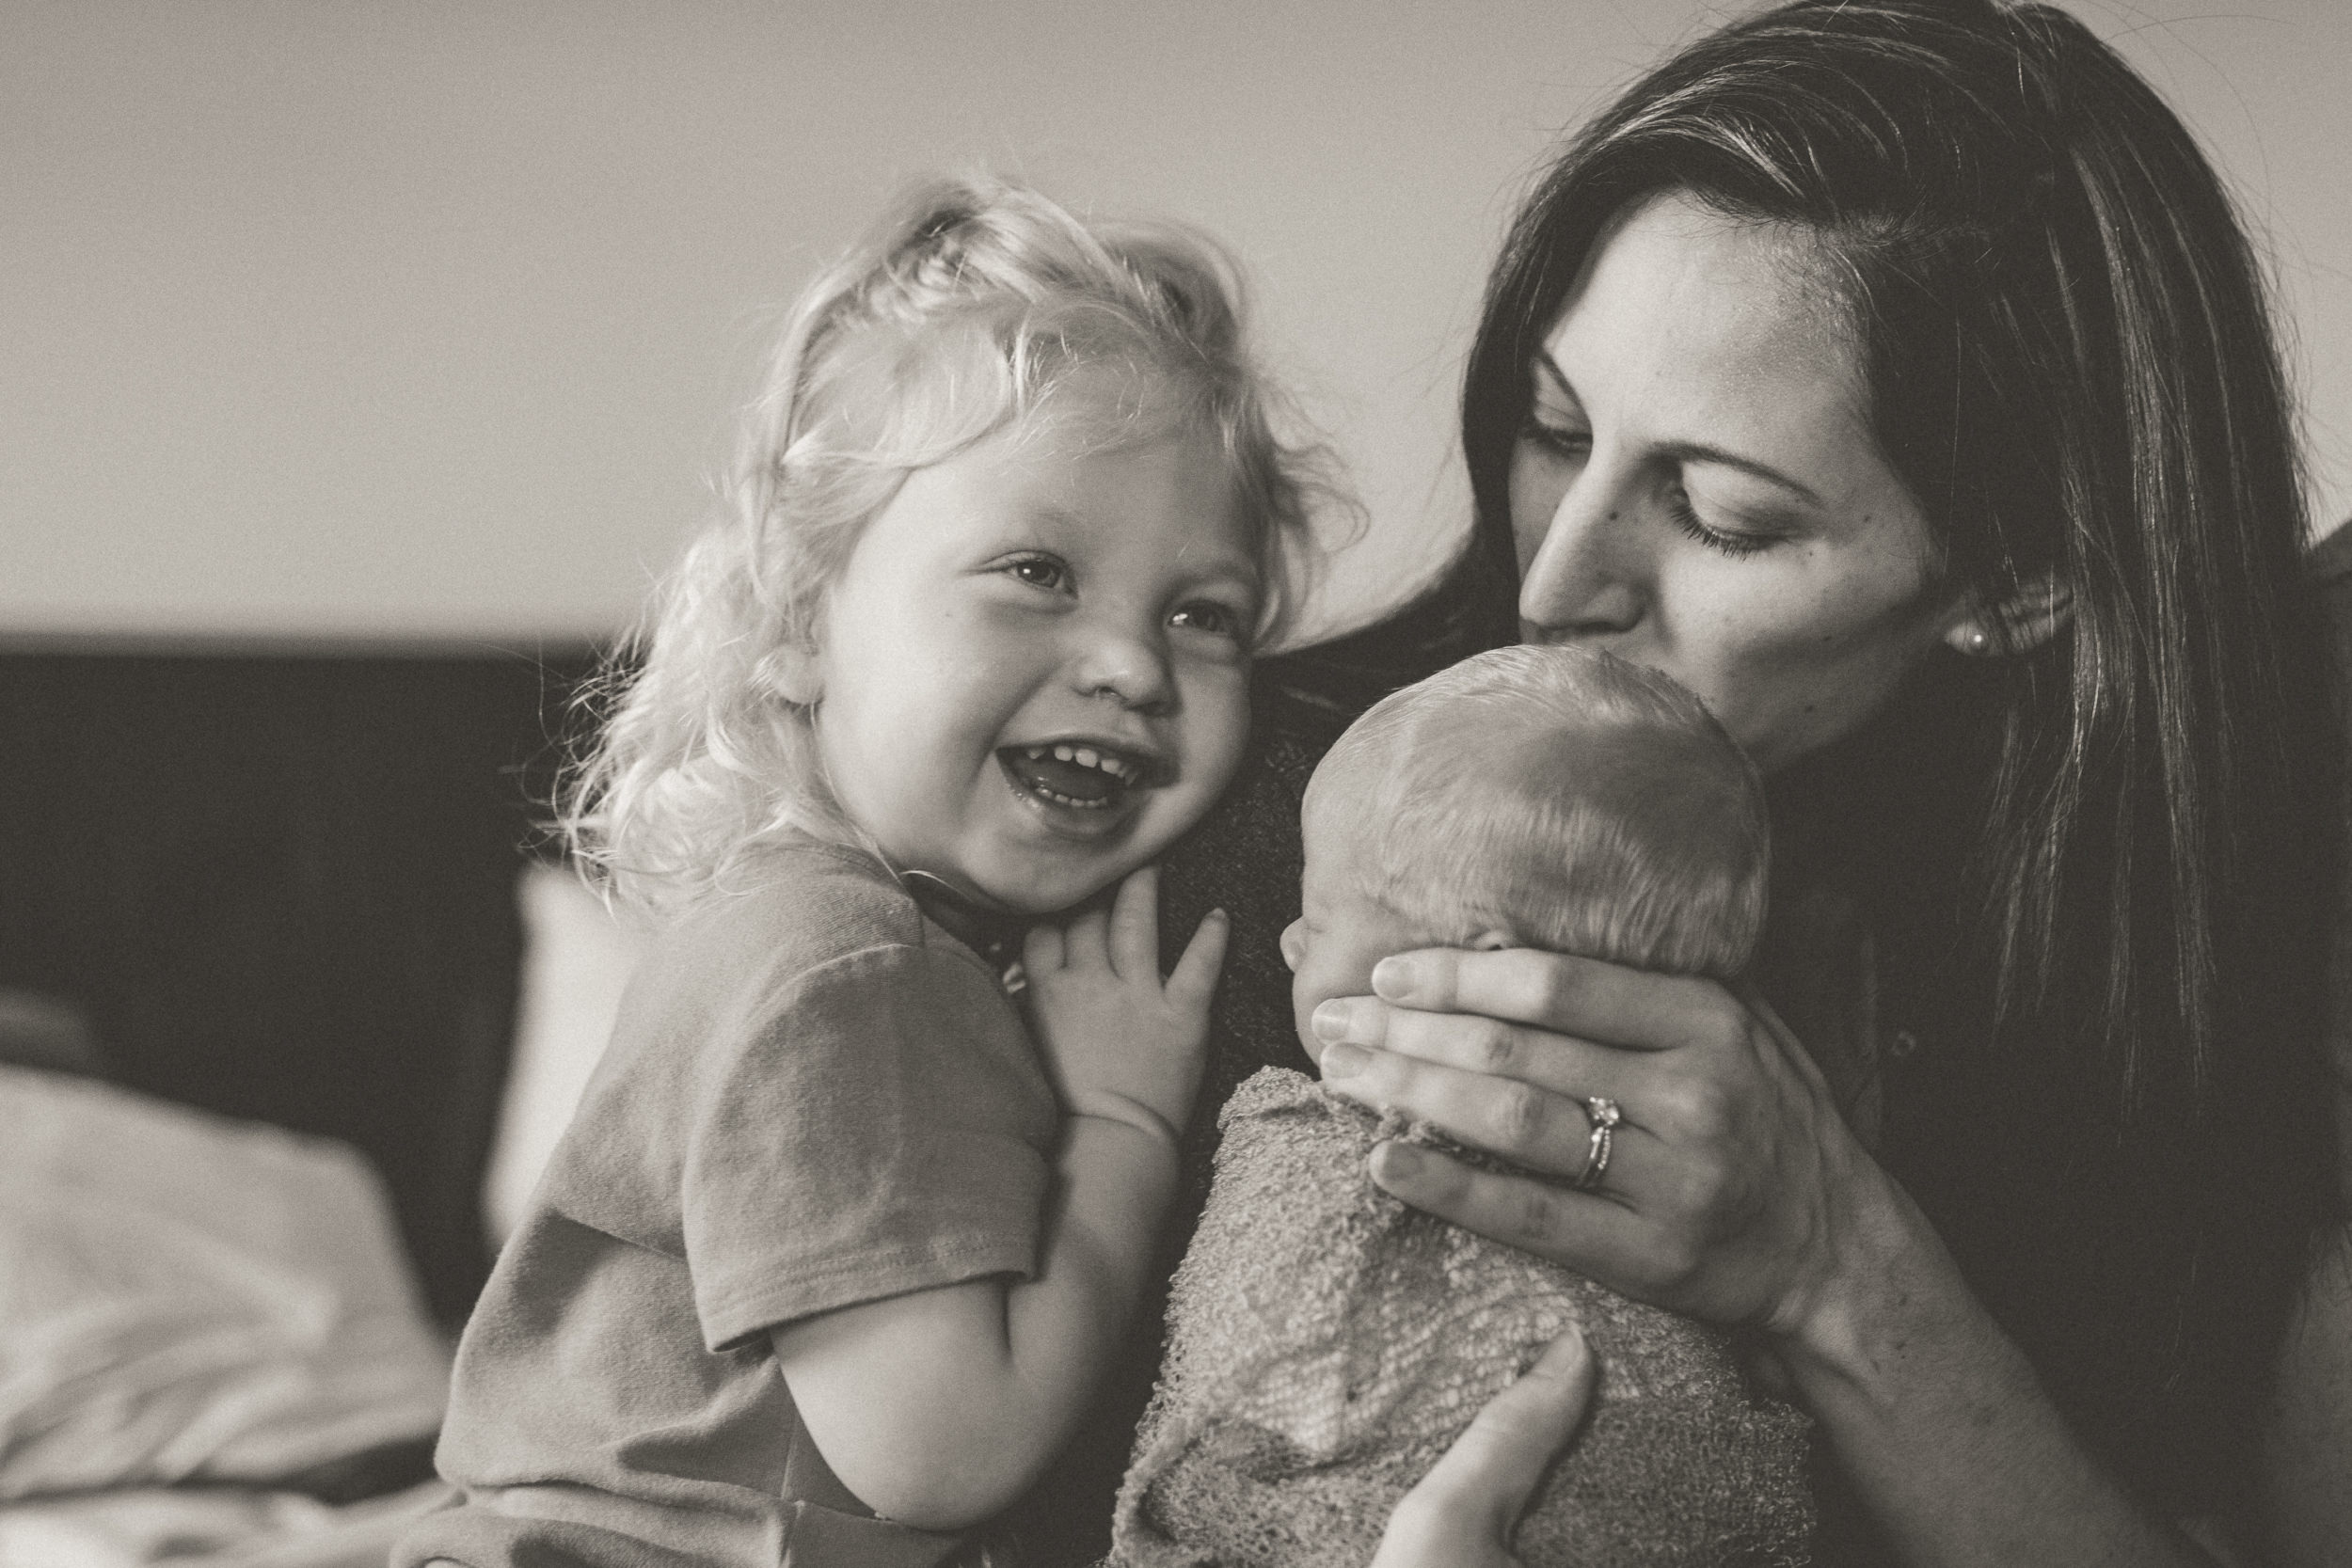 toronto lifestyle photographer ten2tenphotography 46 - Toronto Newborn Twin Photographer